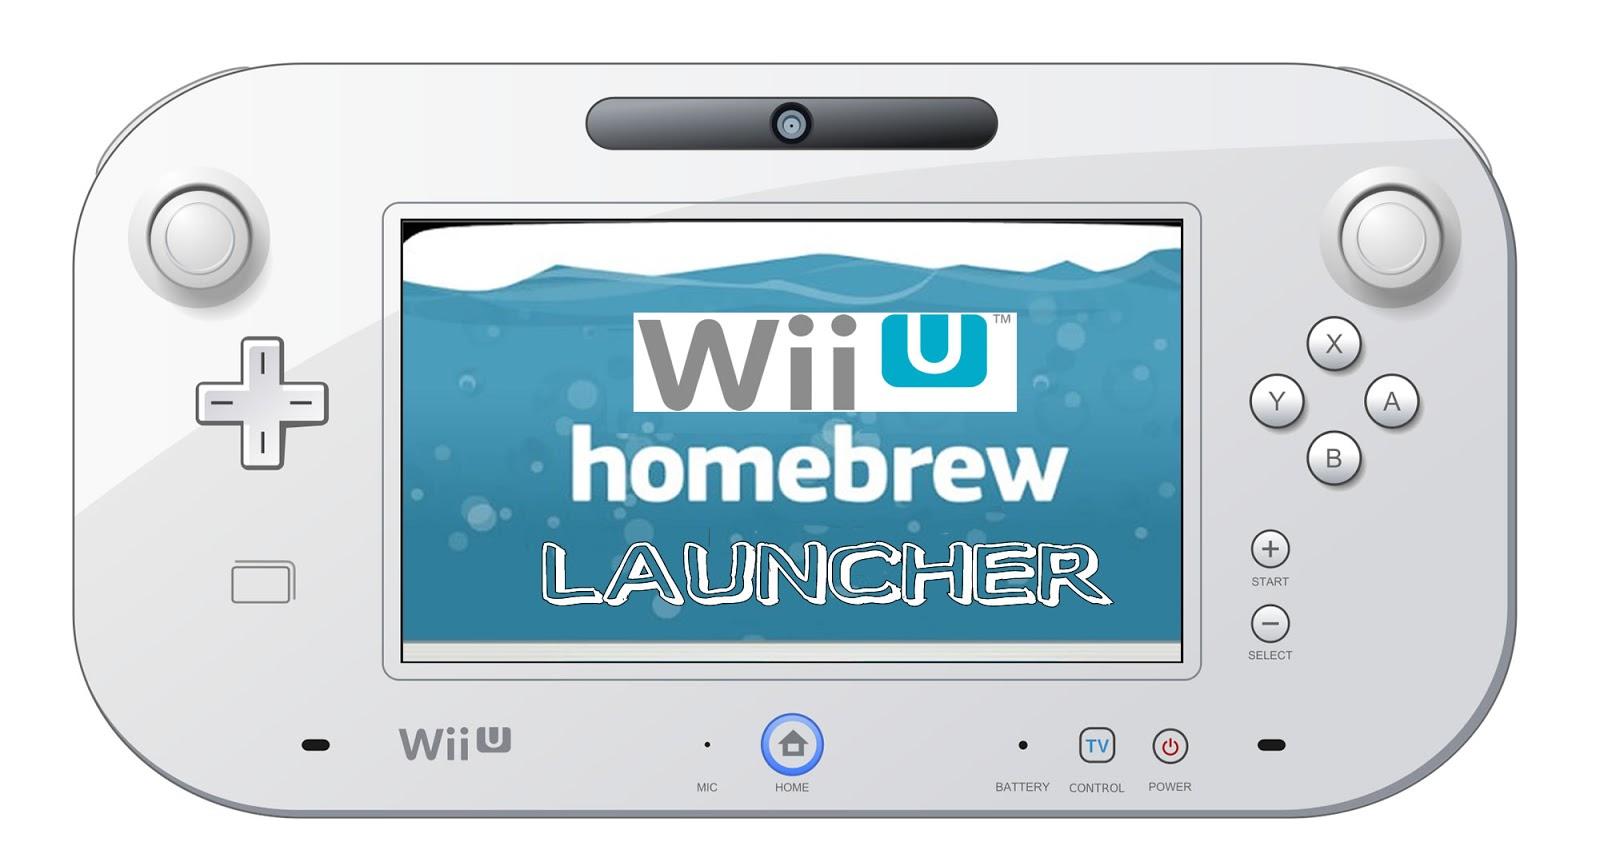 WiiU Homebrew Launcher - Wii U Como usar! - Wii U | Loadiine